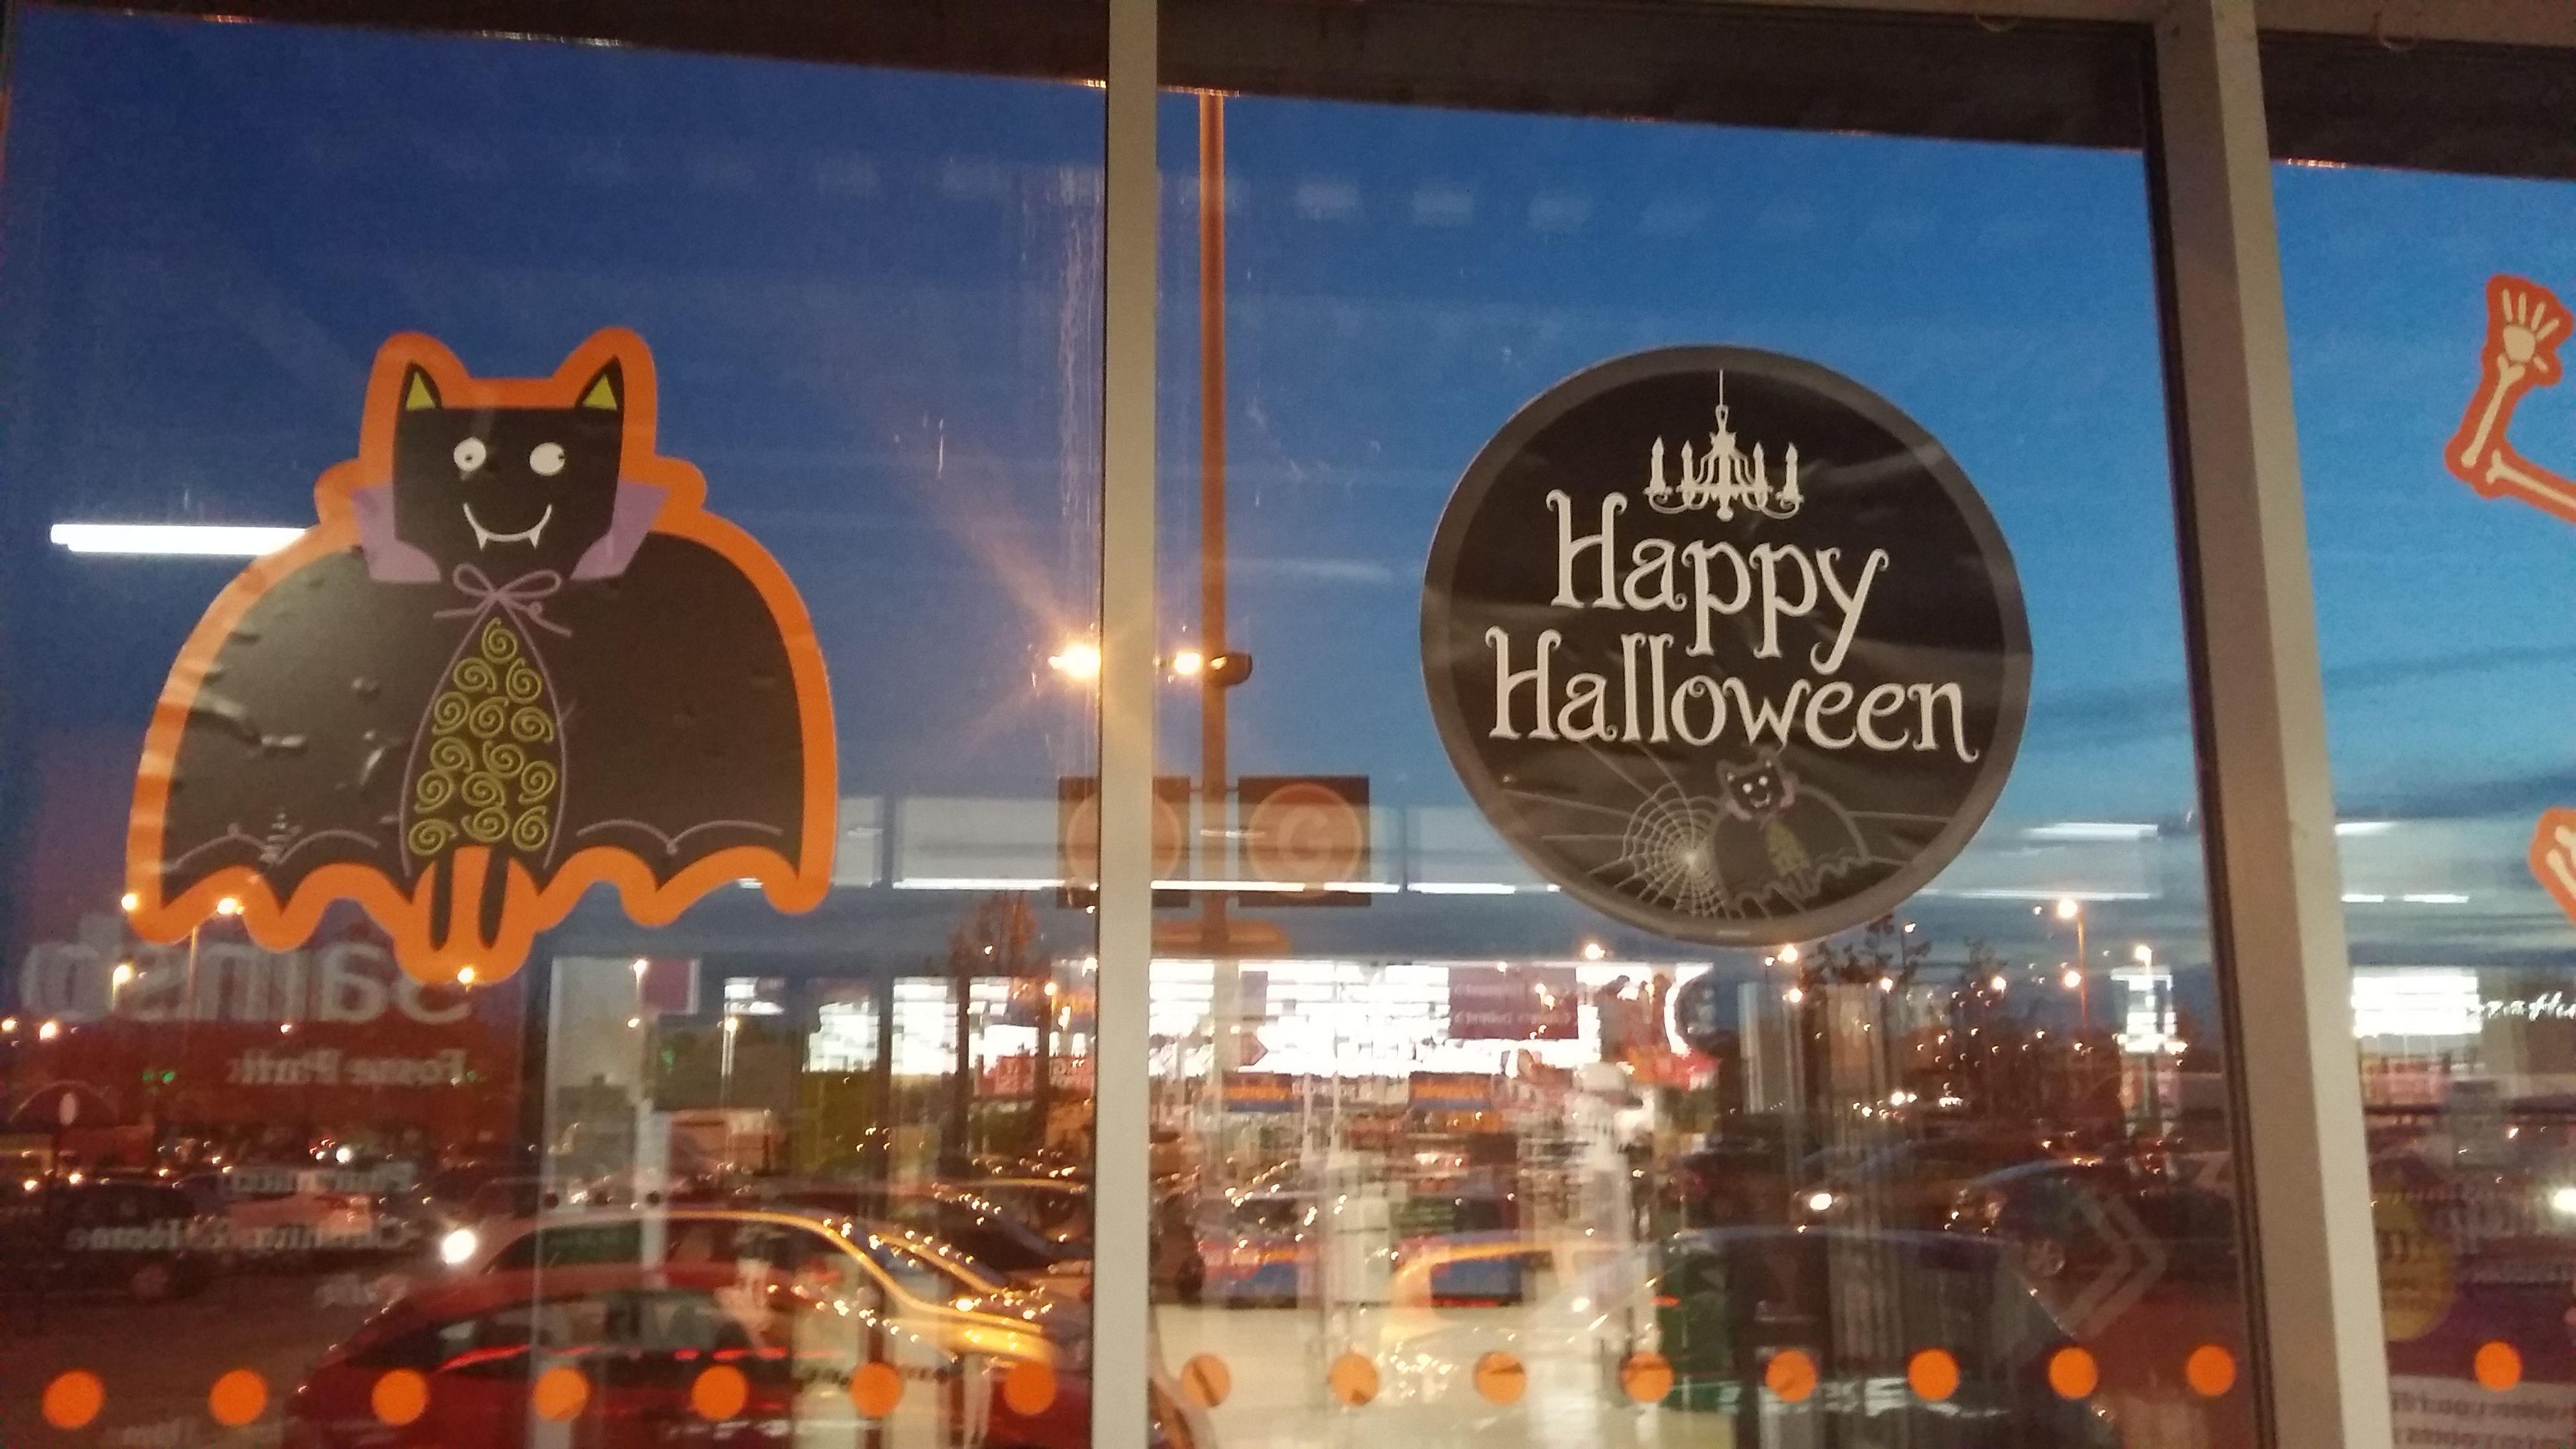 Sainsbury's Halloween 2015 (With images) Halloween 2015